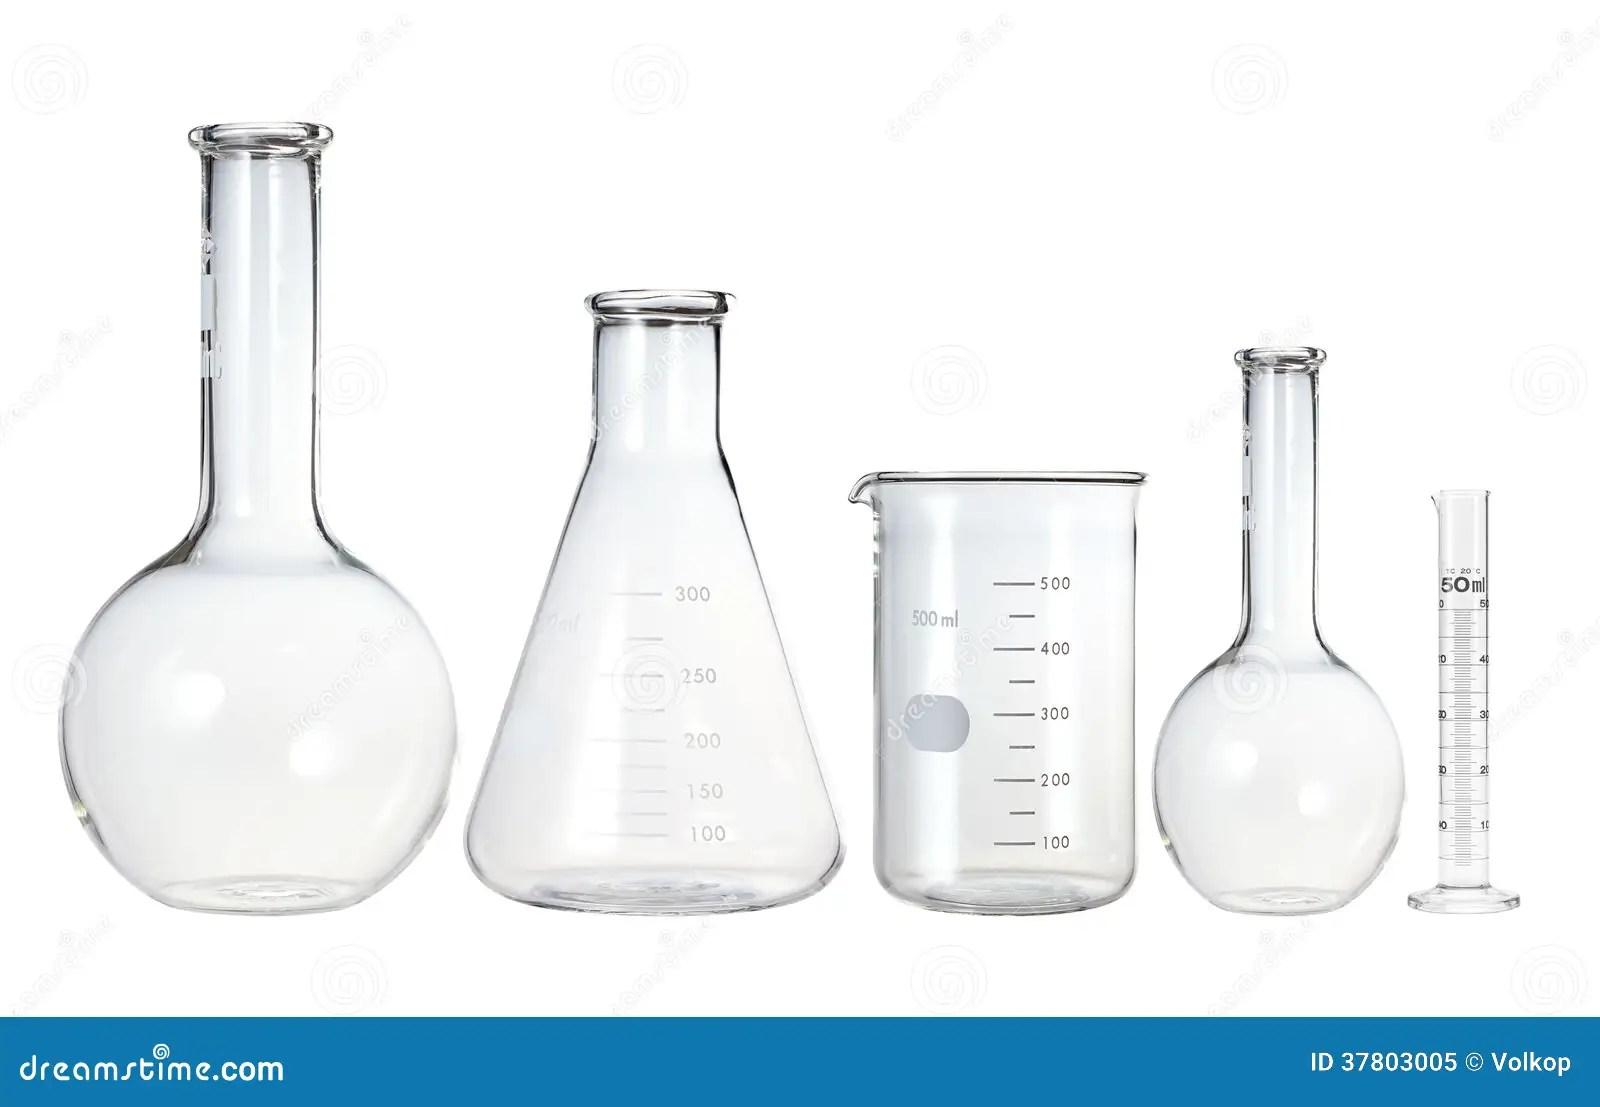 Test Tubes Isolated On White Laboratory Glassware Royalty Free Stock Photo